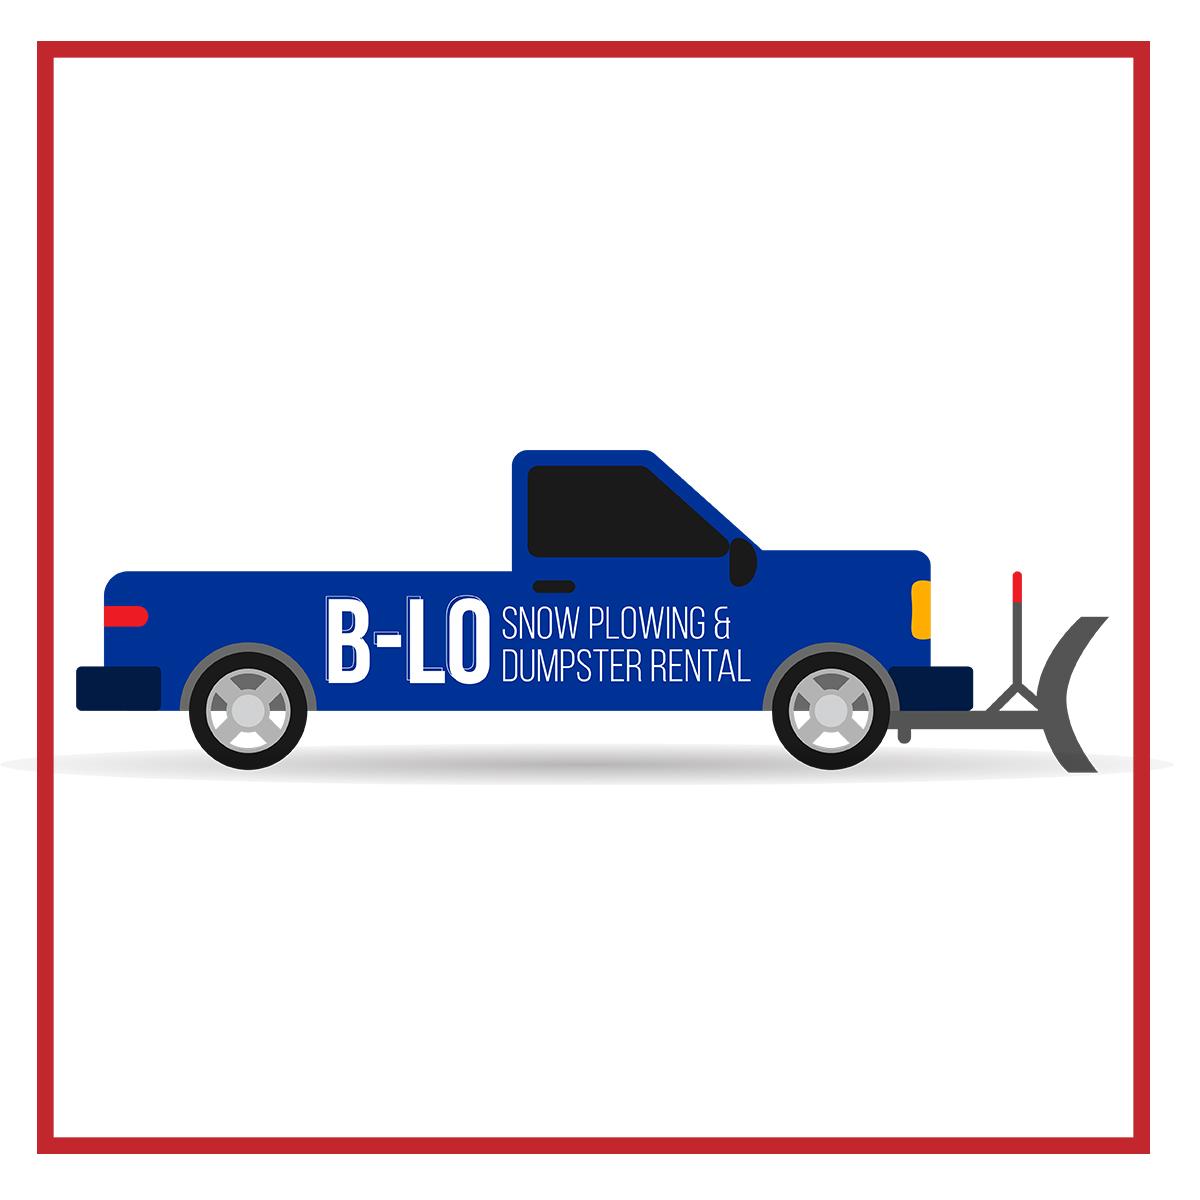 B-Lo Snow Plowing & Dumpster Rental